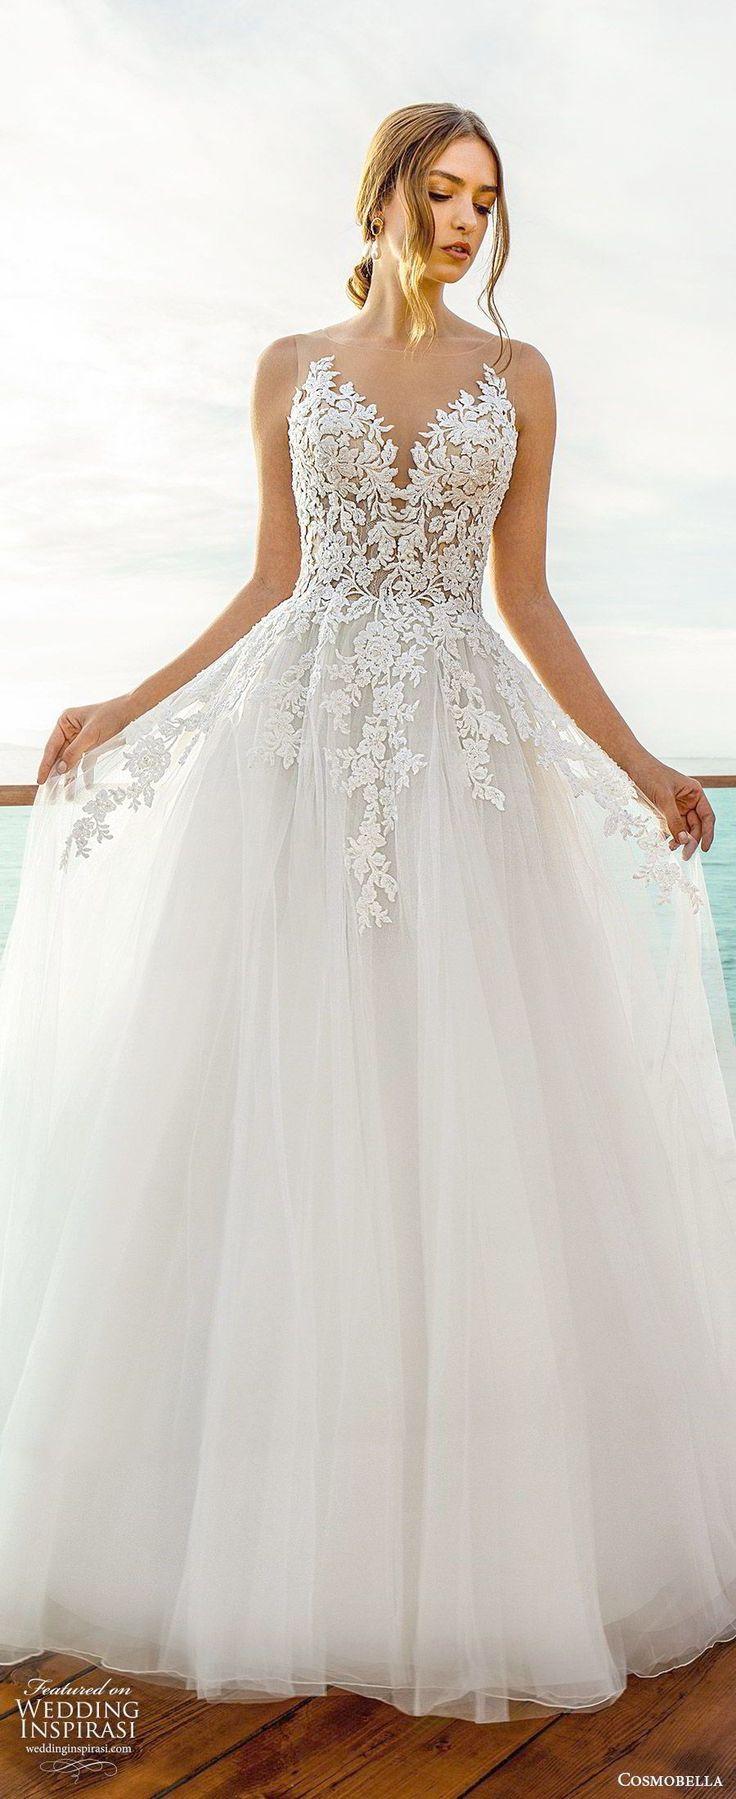 Lace Wedding Dresses Canada down Wedding Venues Near Miami